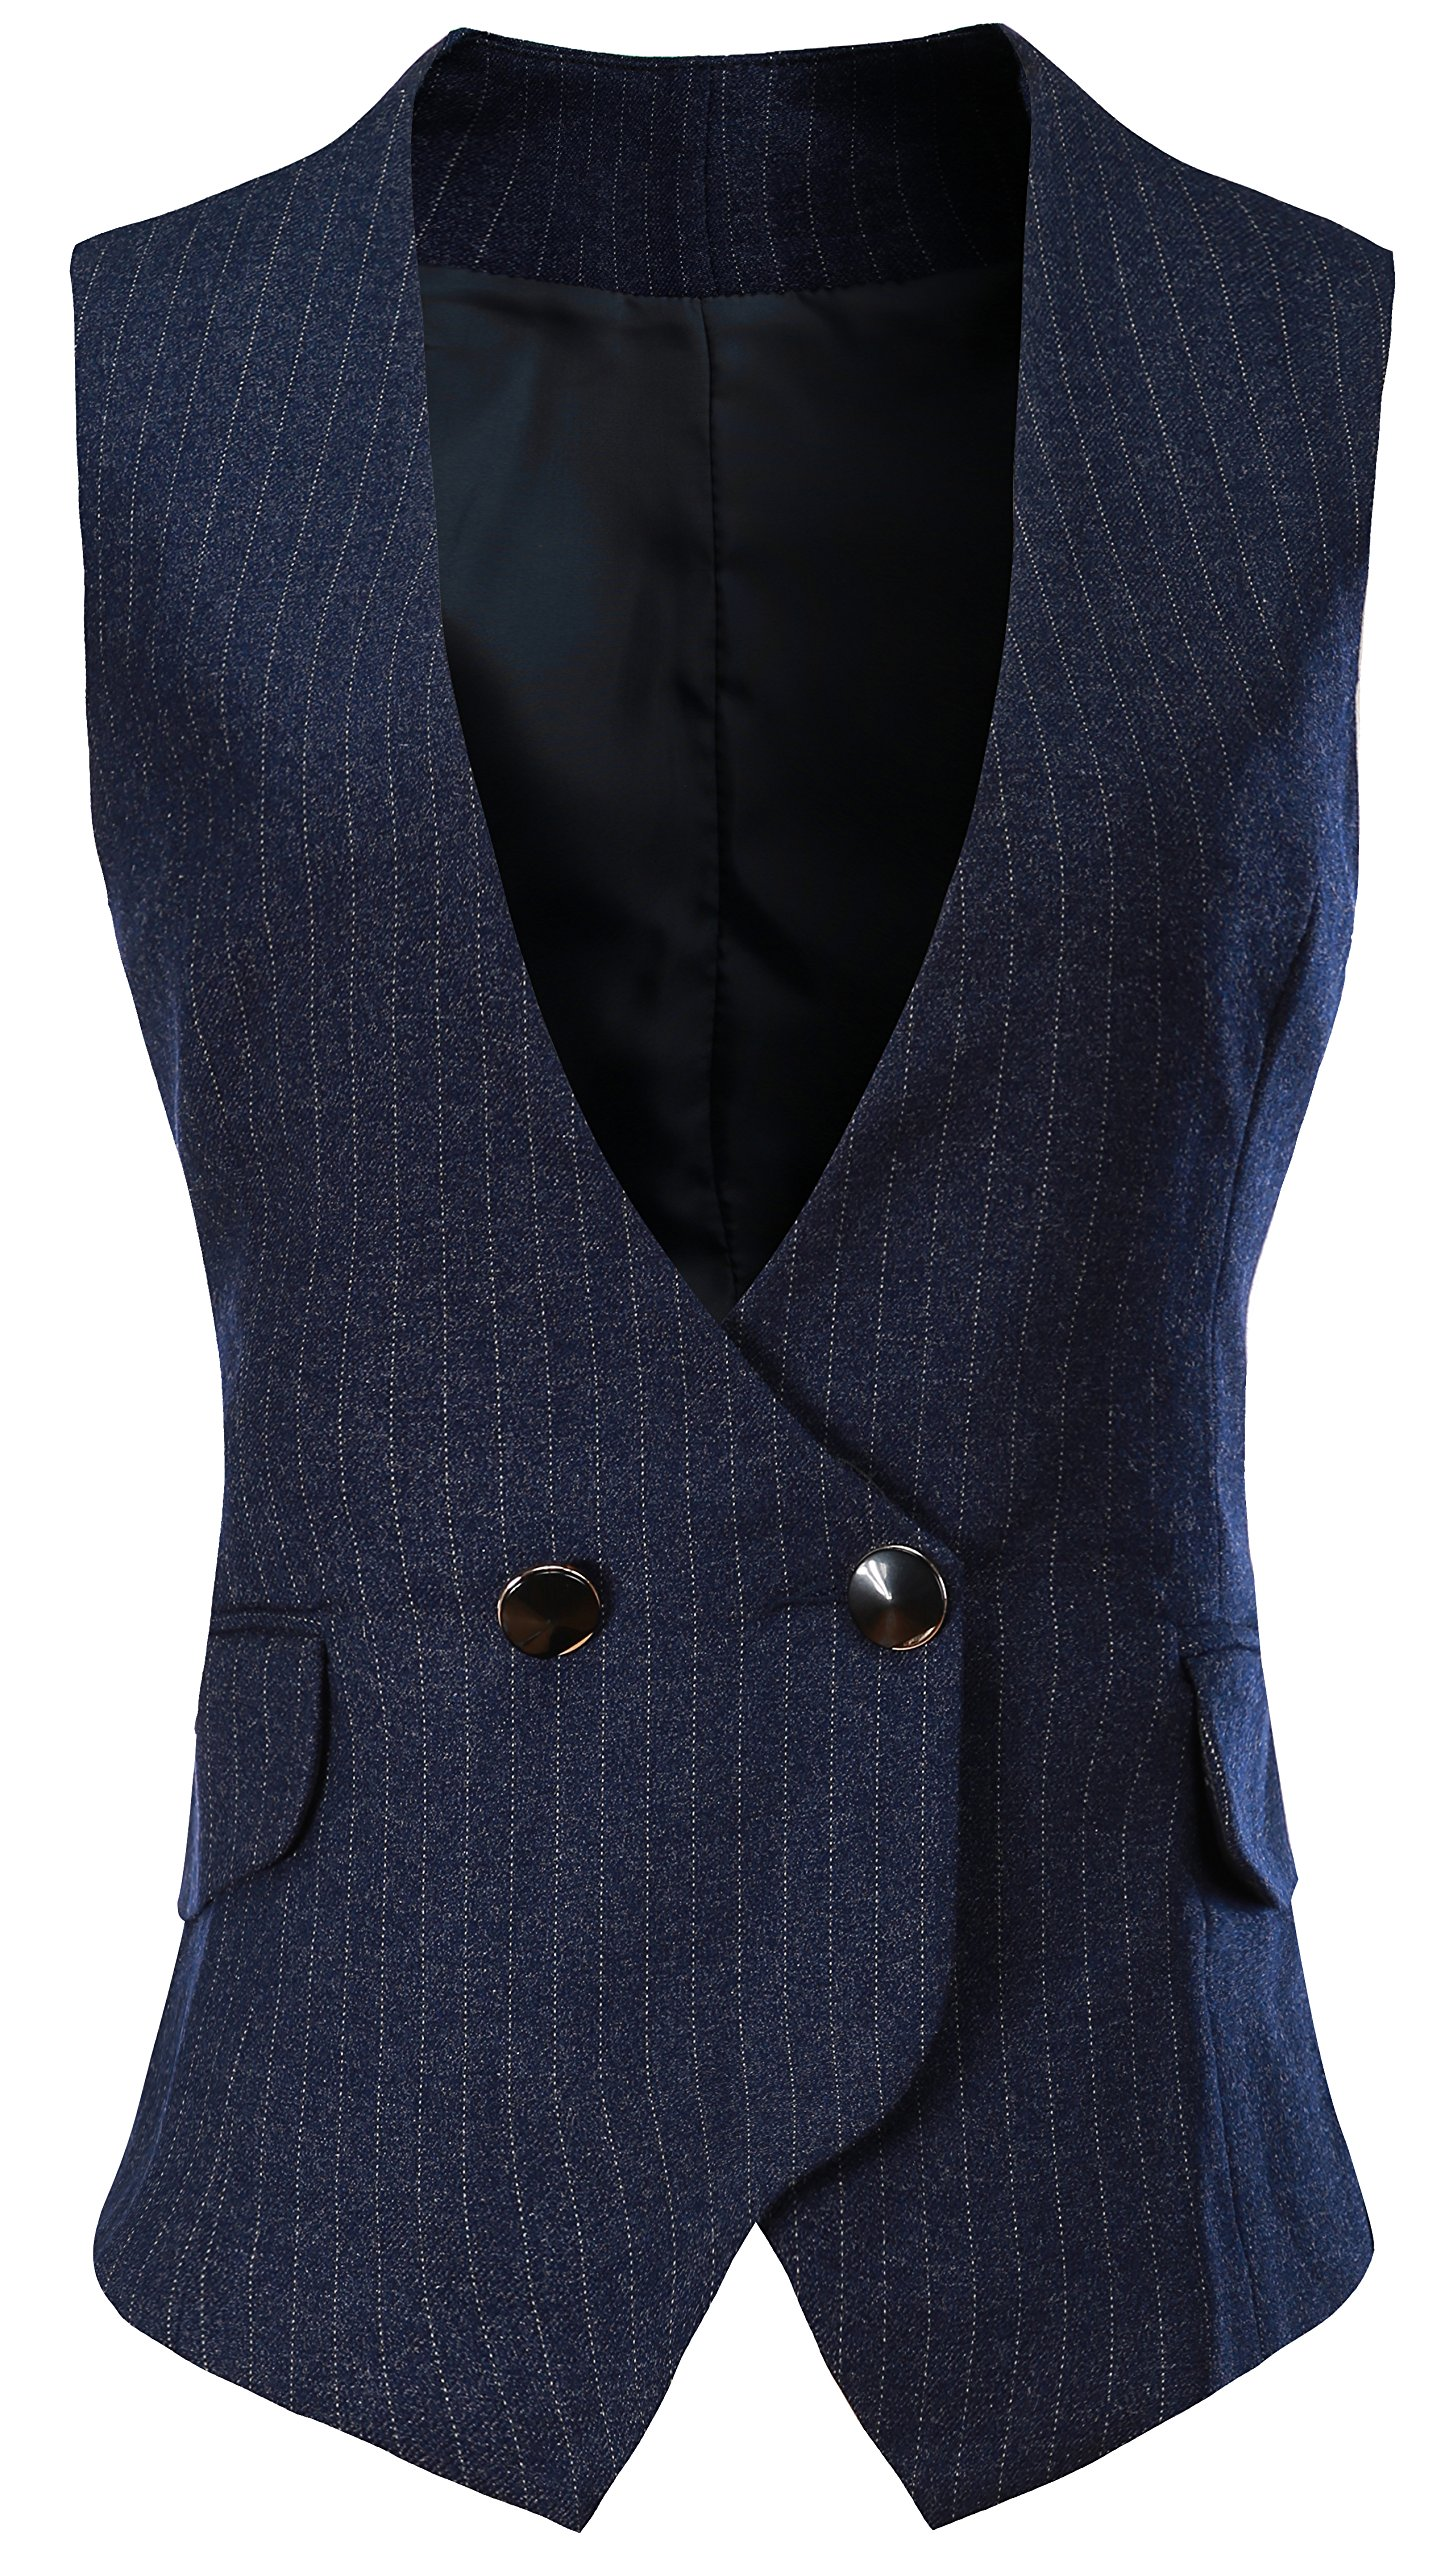 Vocni Women V-Neck Lined Slim Fit Waistcoat Dreesy Suit Vest Style 2_blue Pinstripe US XS(Asia M) (Fit Bust 30.3''-32.7'')